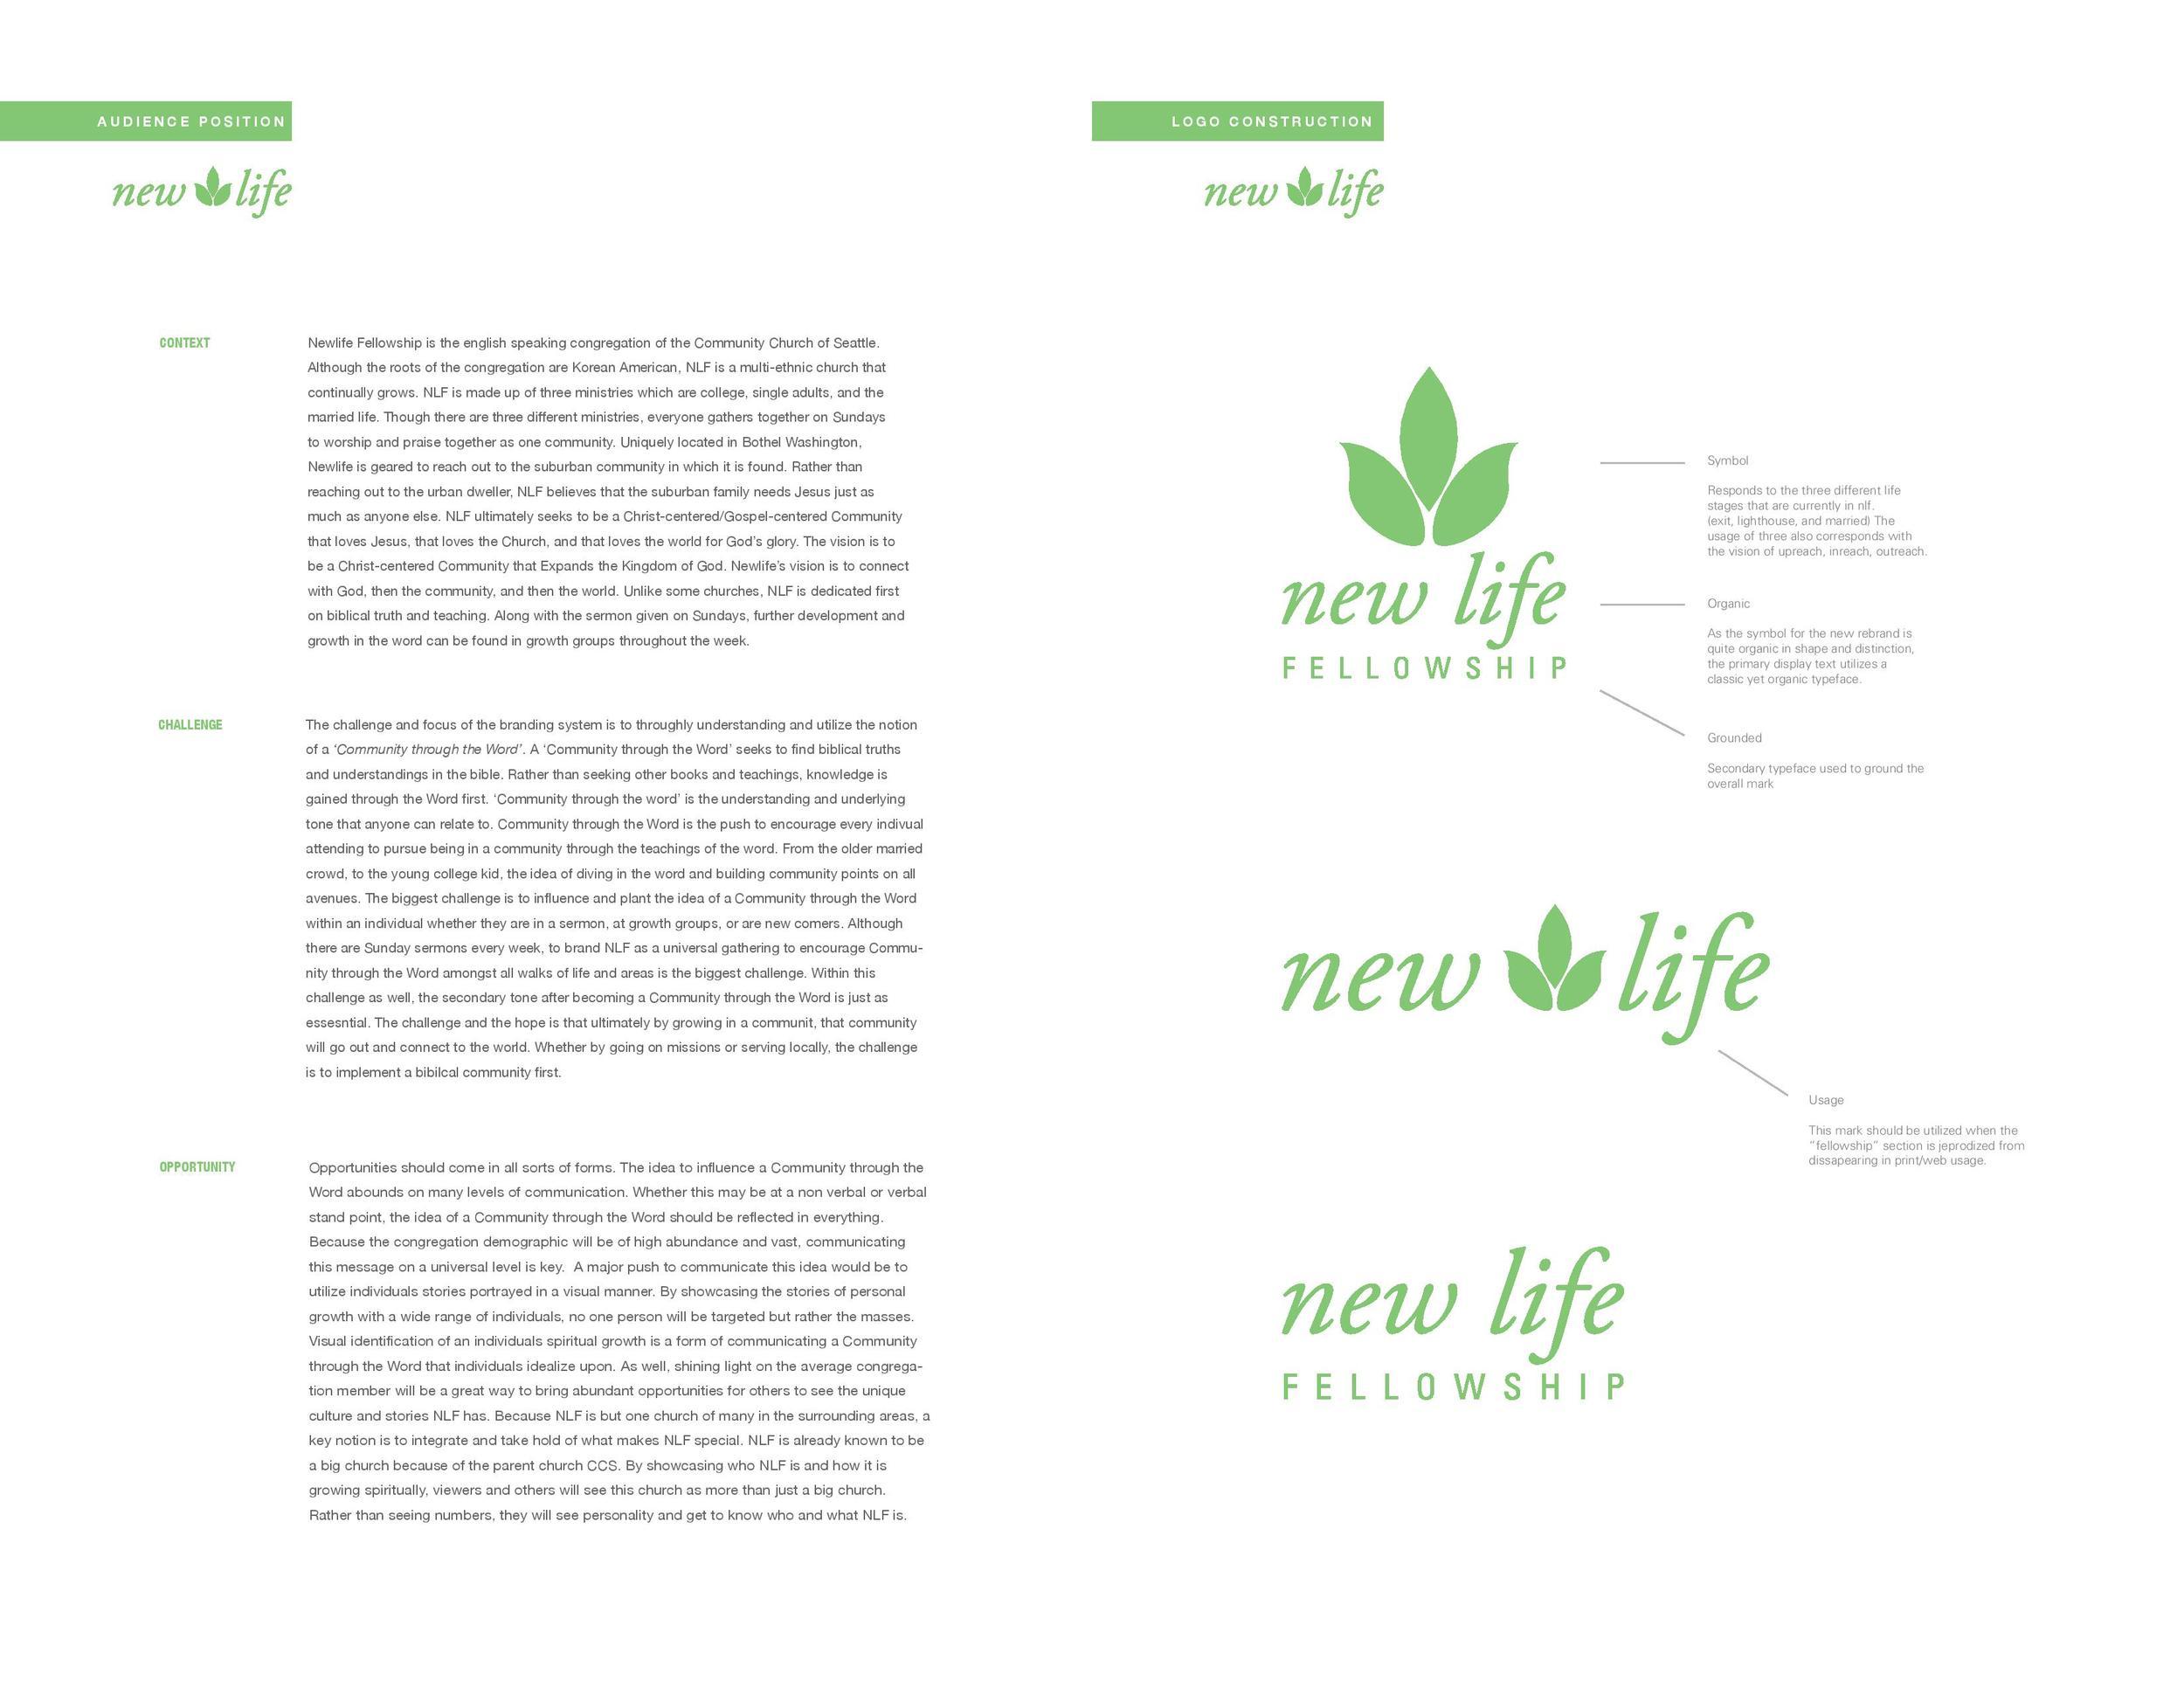 nlf_rebrand-page-002.jpg